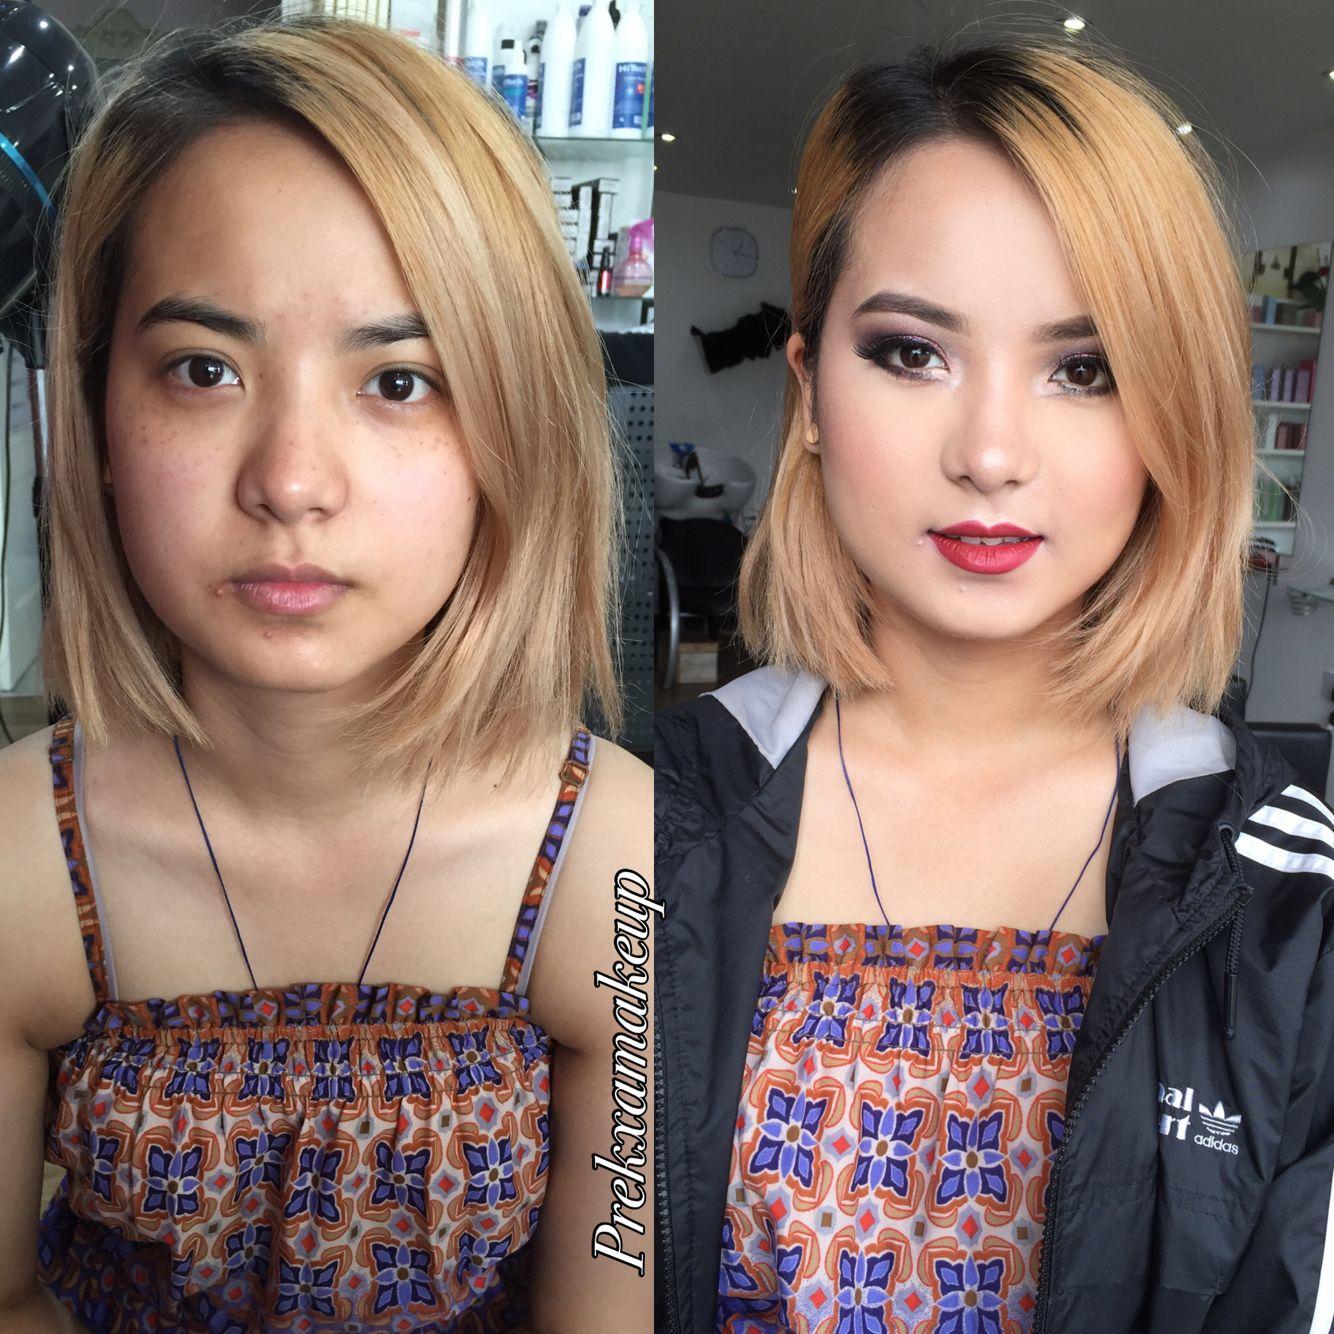 Makeup transformation, Follow me on Instagram - Prekxa_b #makeup # transformation #asian